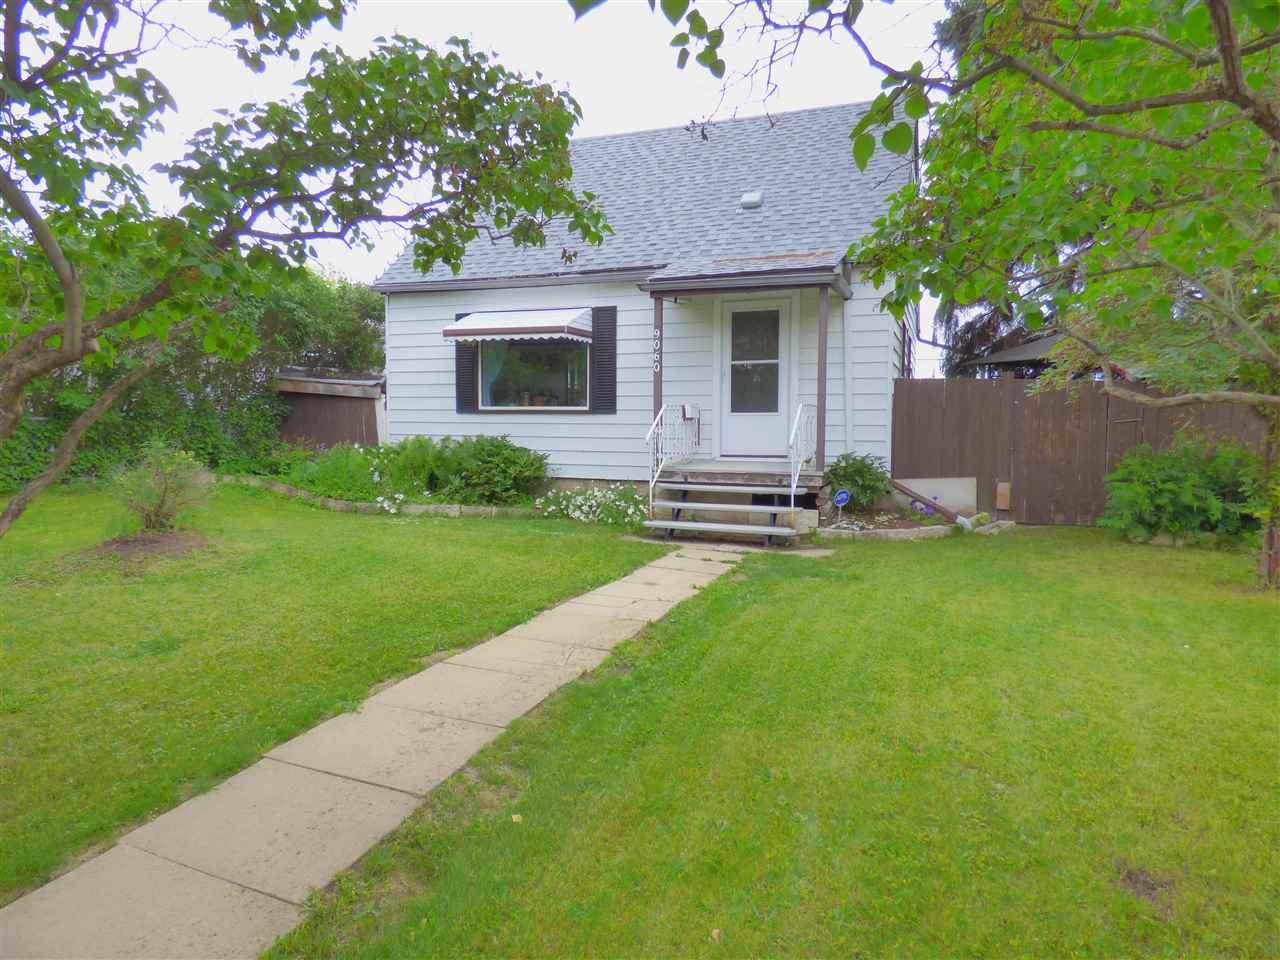 Main Photo: 9060 151 Street in Edmonton: Zone 22 House for sale : MLS®# E4165289